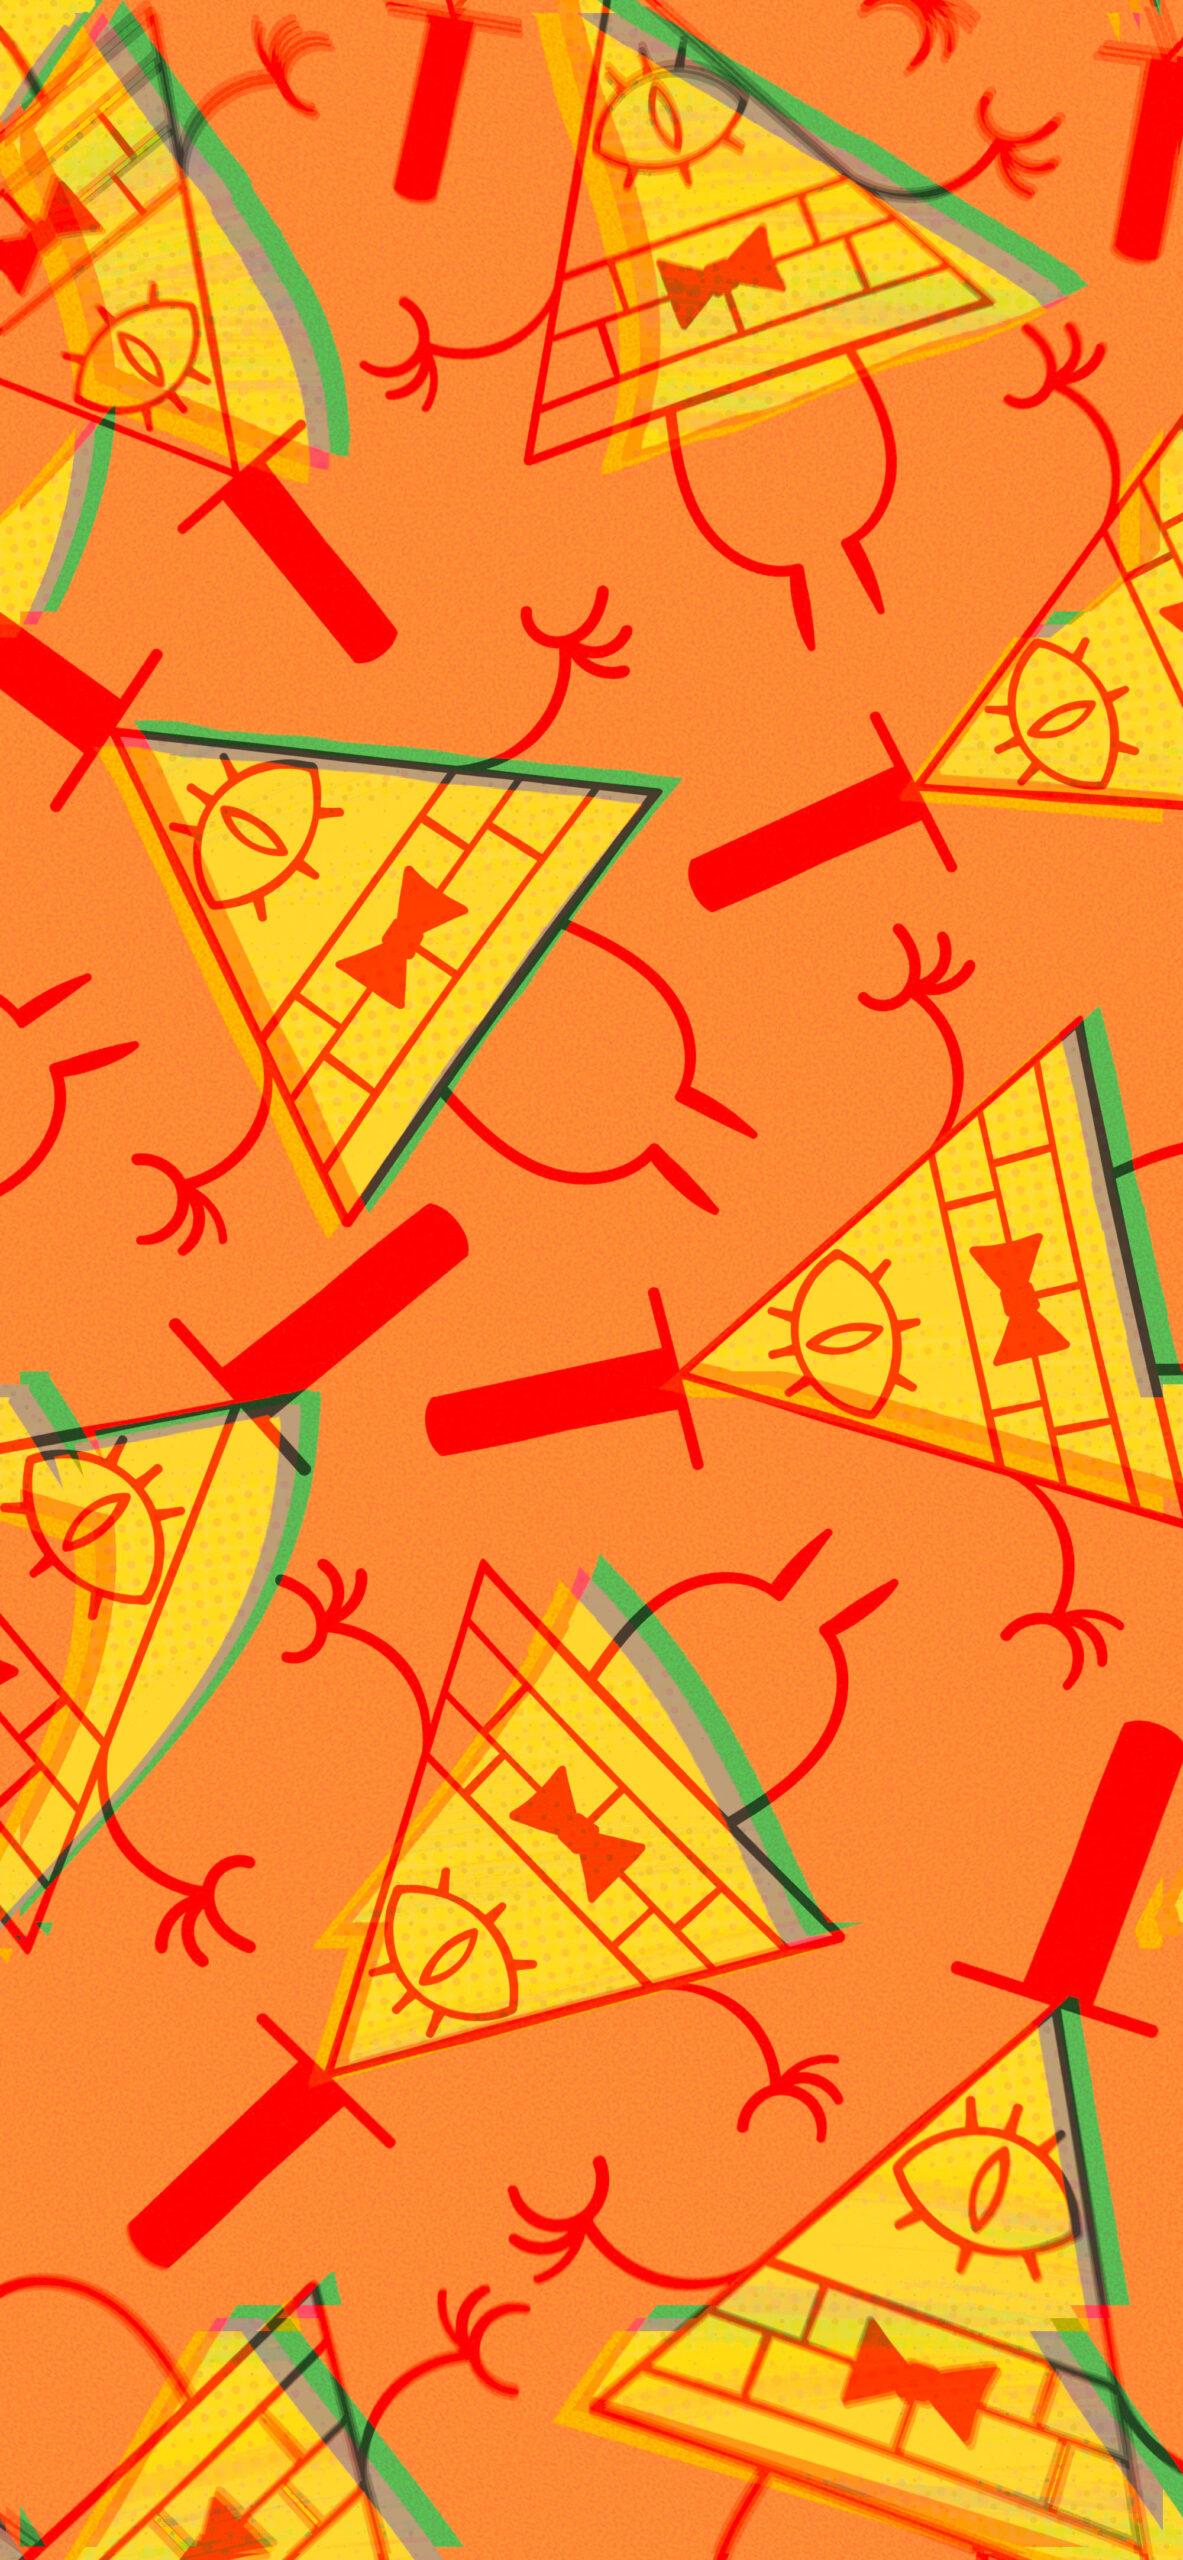 gravity falls bill cipher art orange background